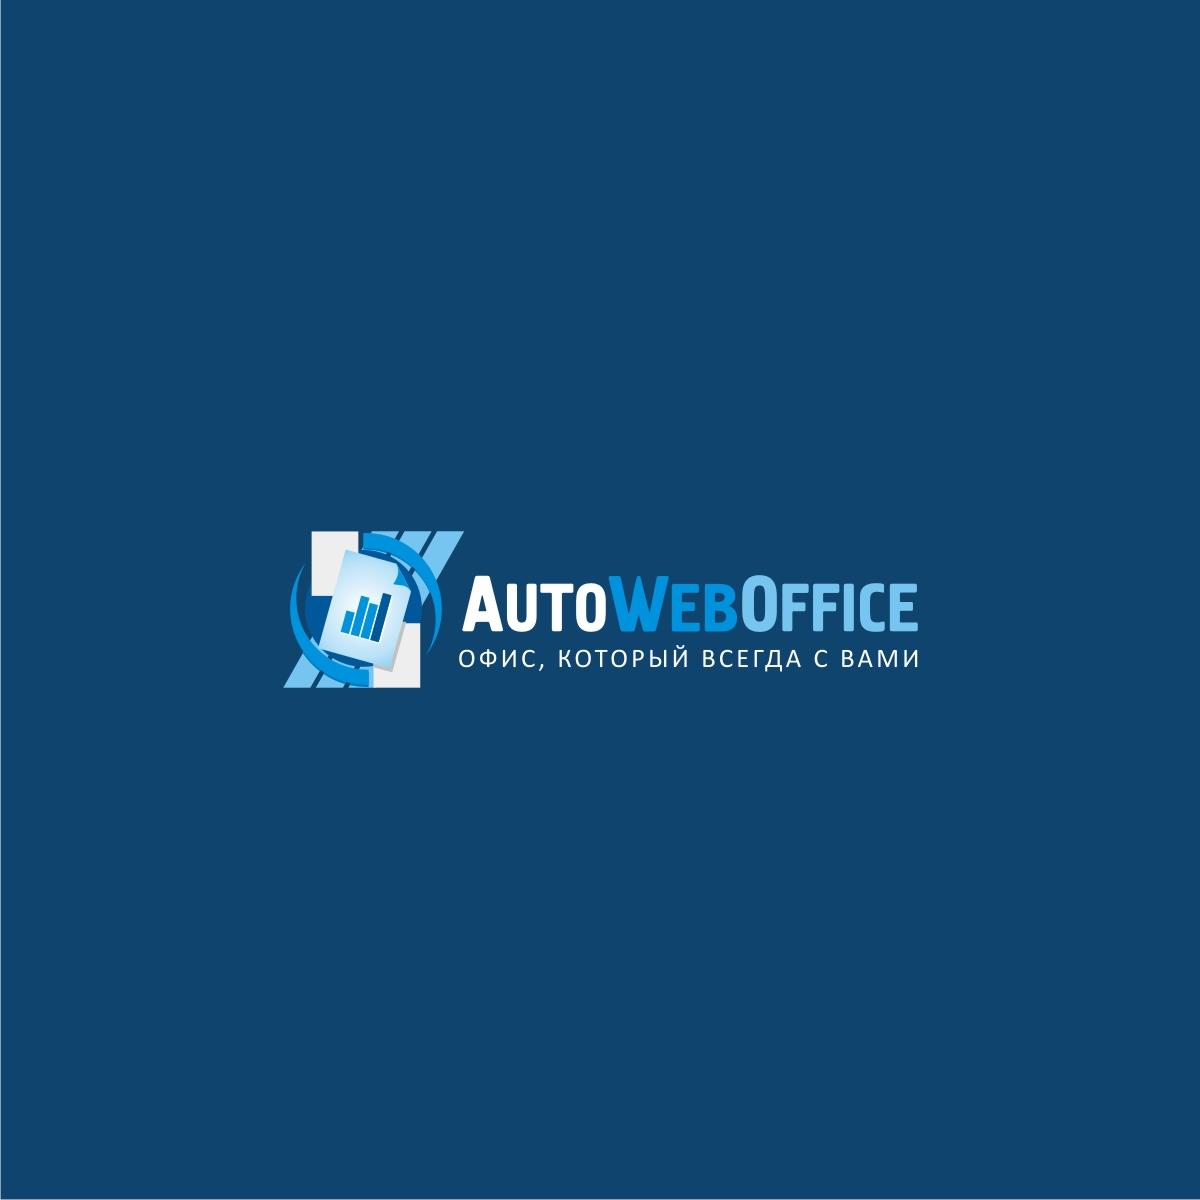 нужно разработать логотип компании фото f_1805579eb3d60946.jpg